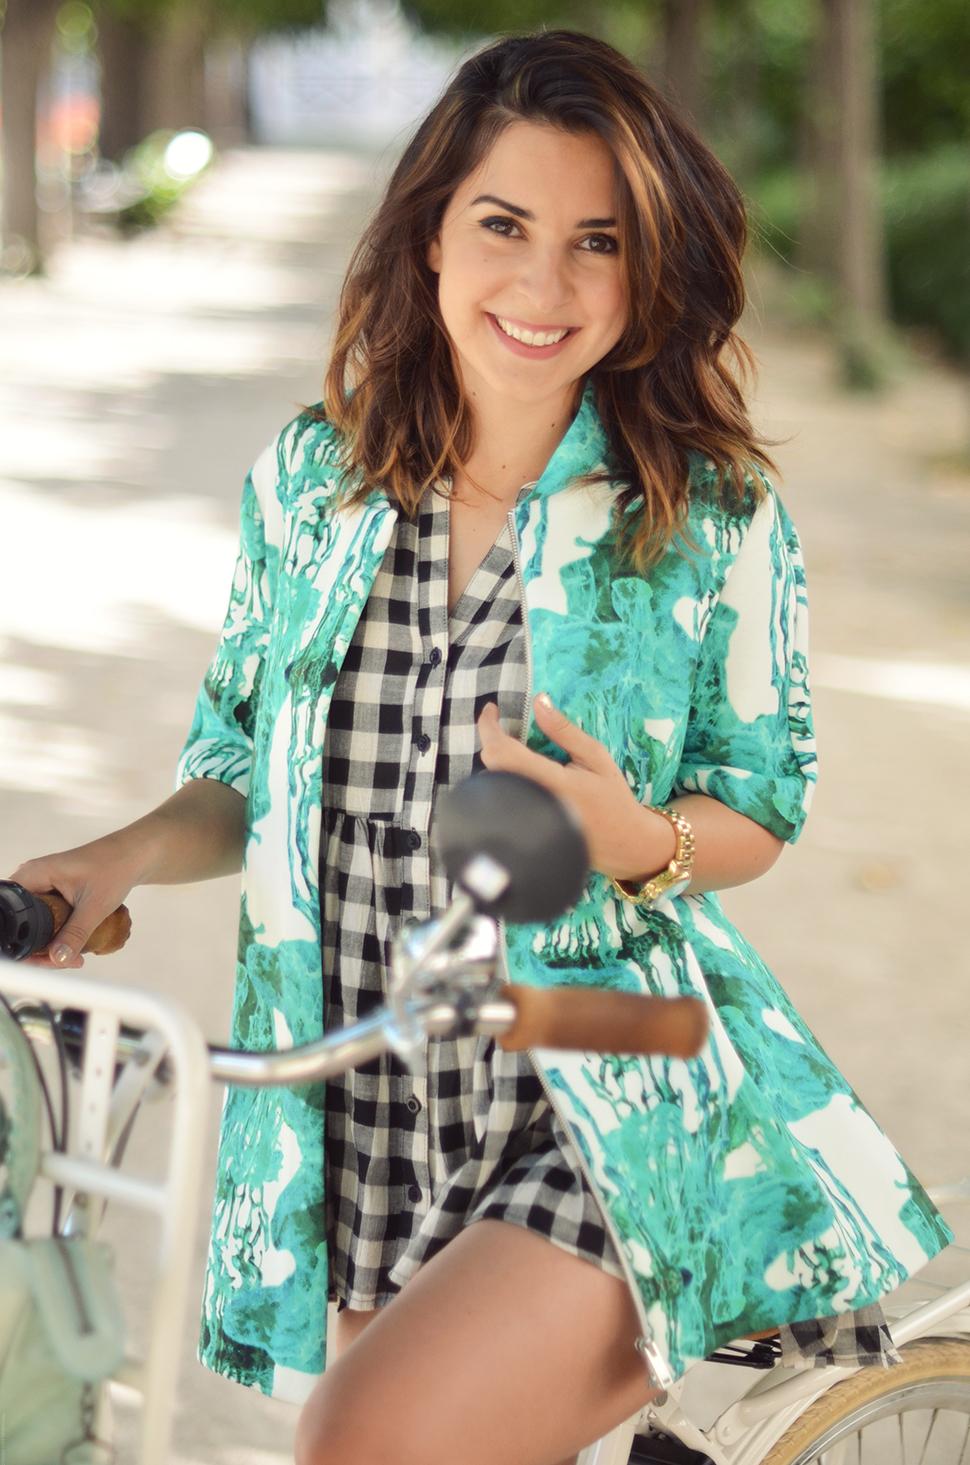 Helloitsvalentine_Anthropologie_look_bike_14